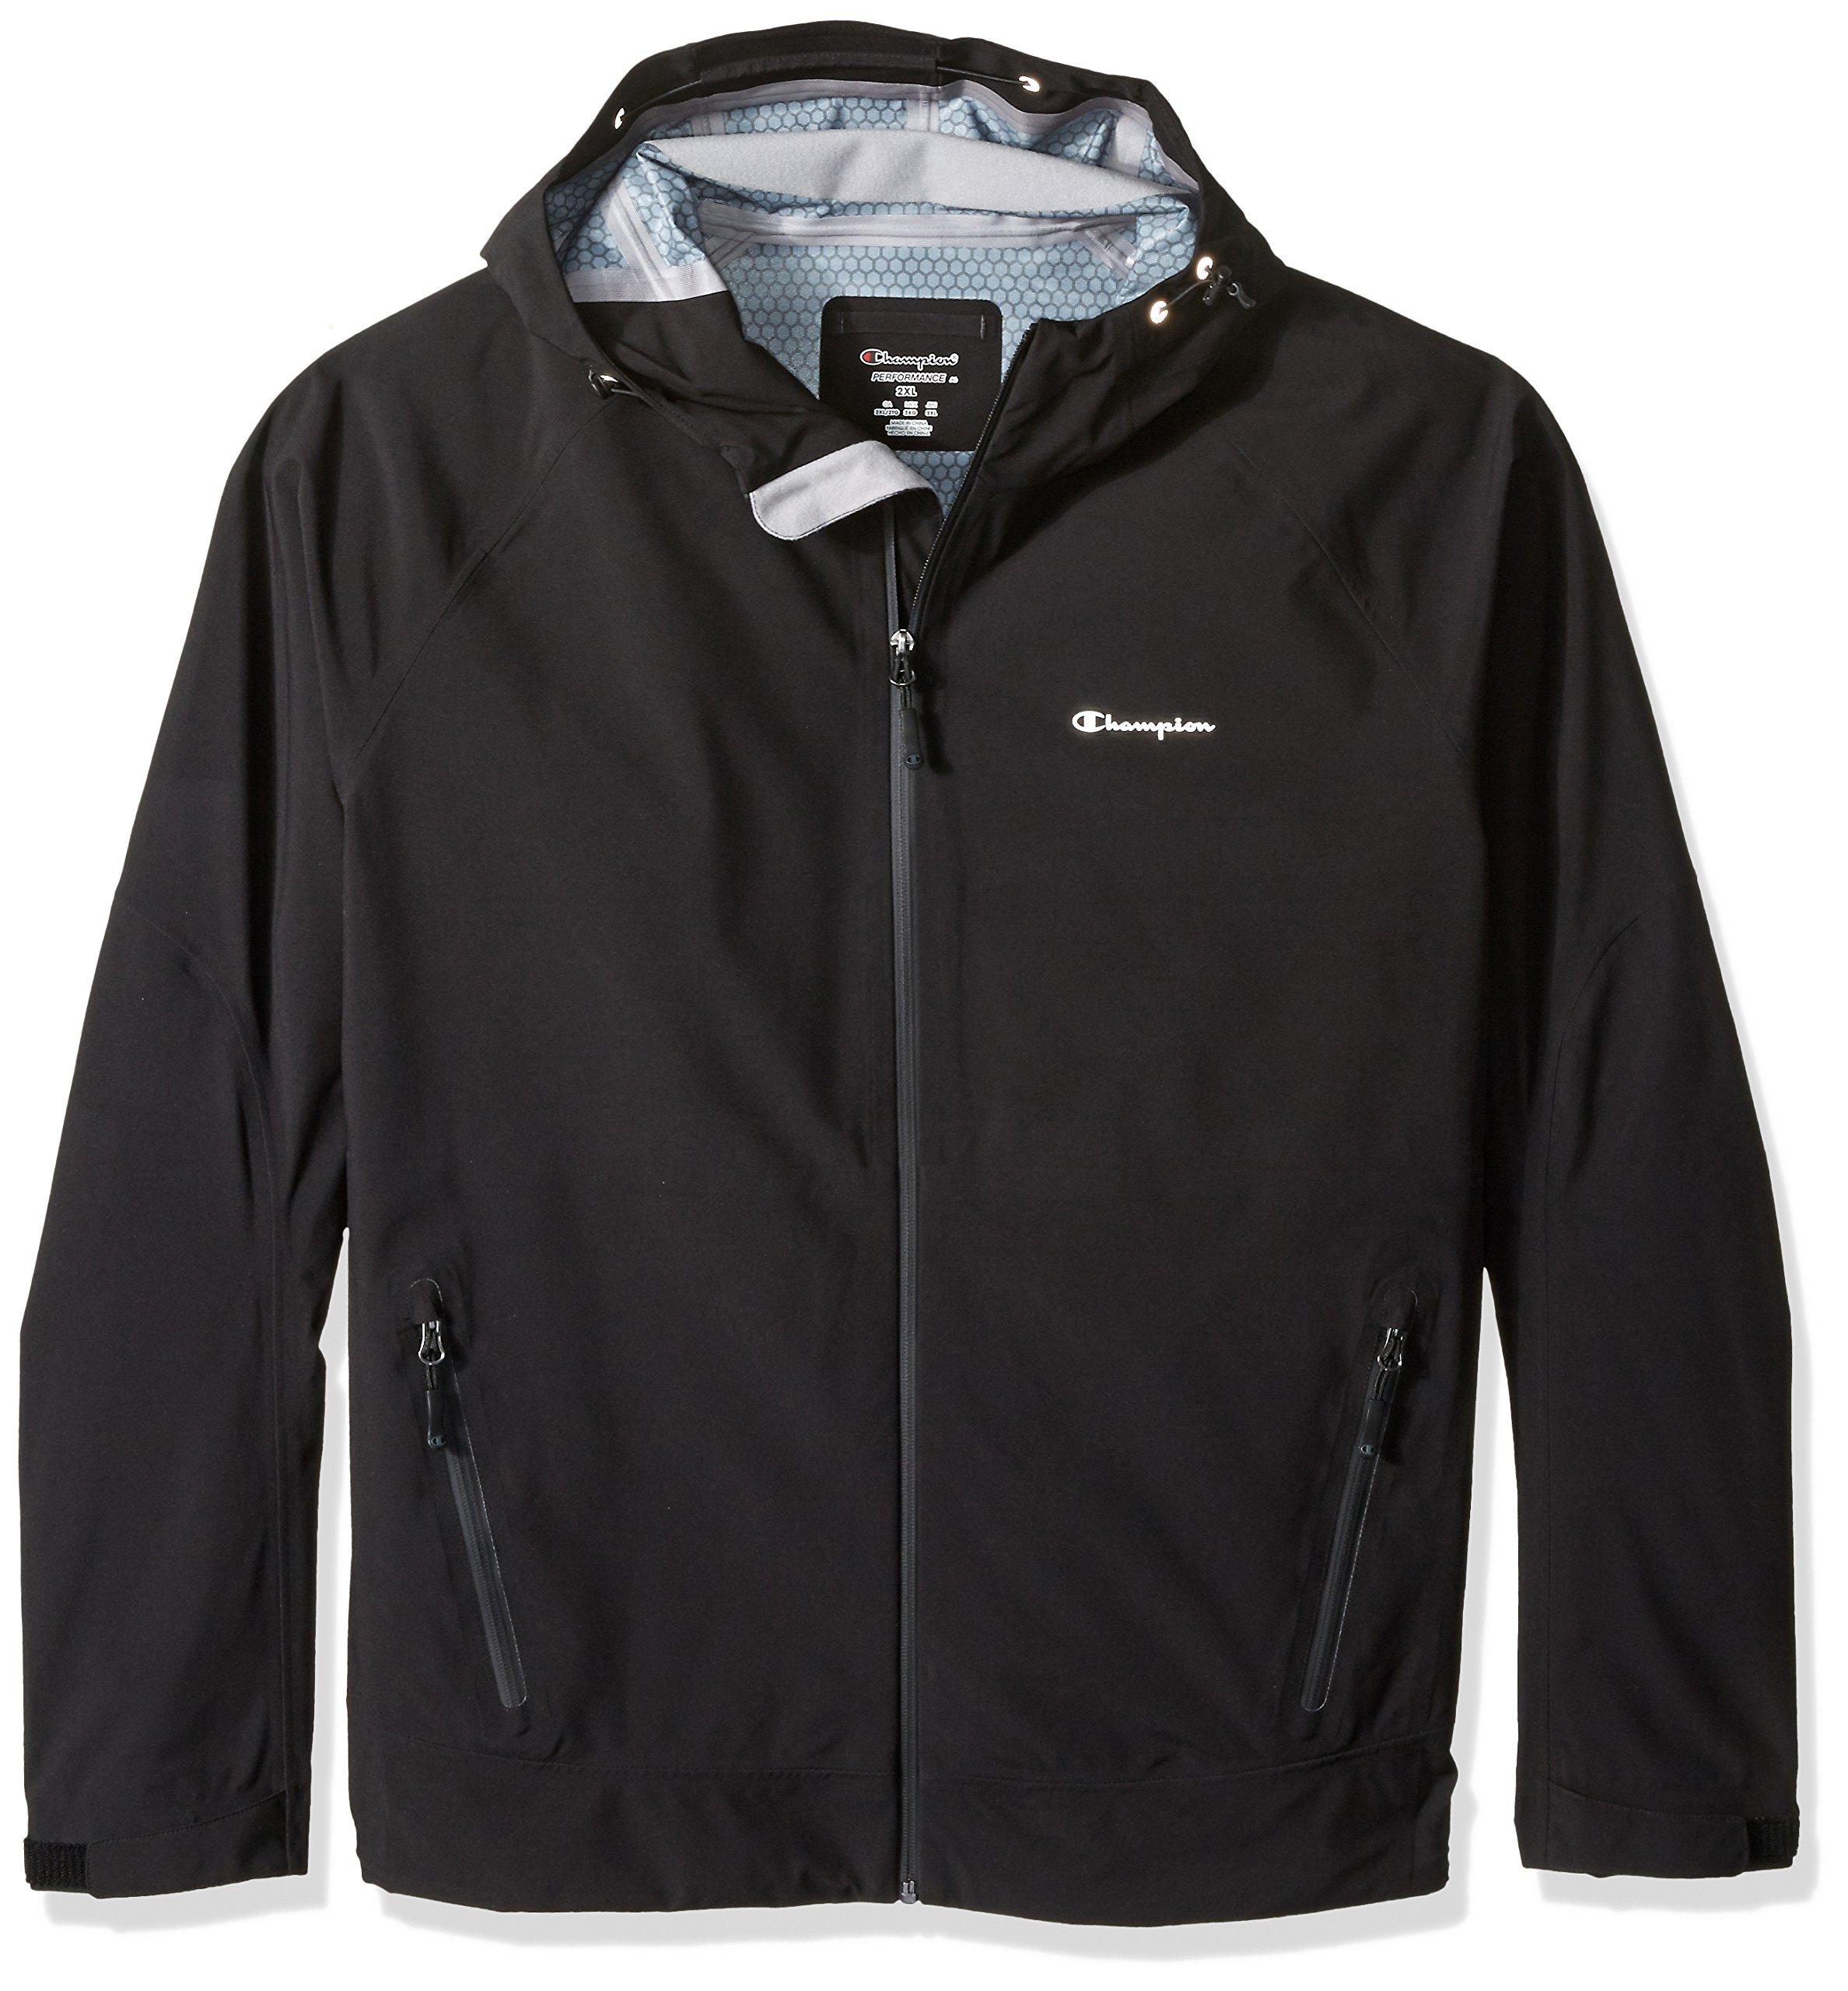 Champion Men's Stretch Waterproof Rain Jacket-Big Sizes, Black, 4X-Large